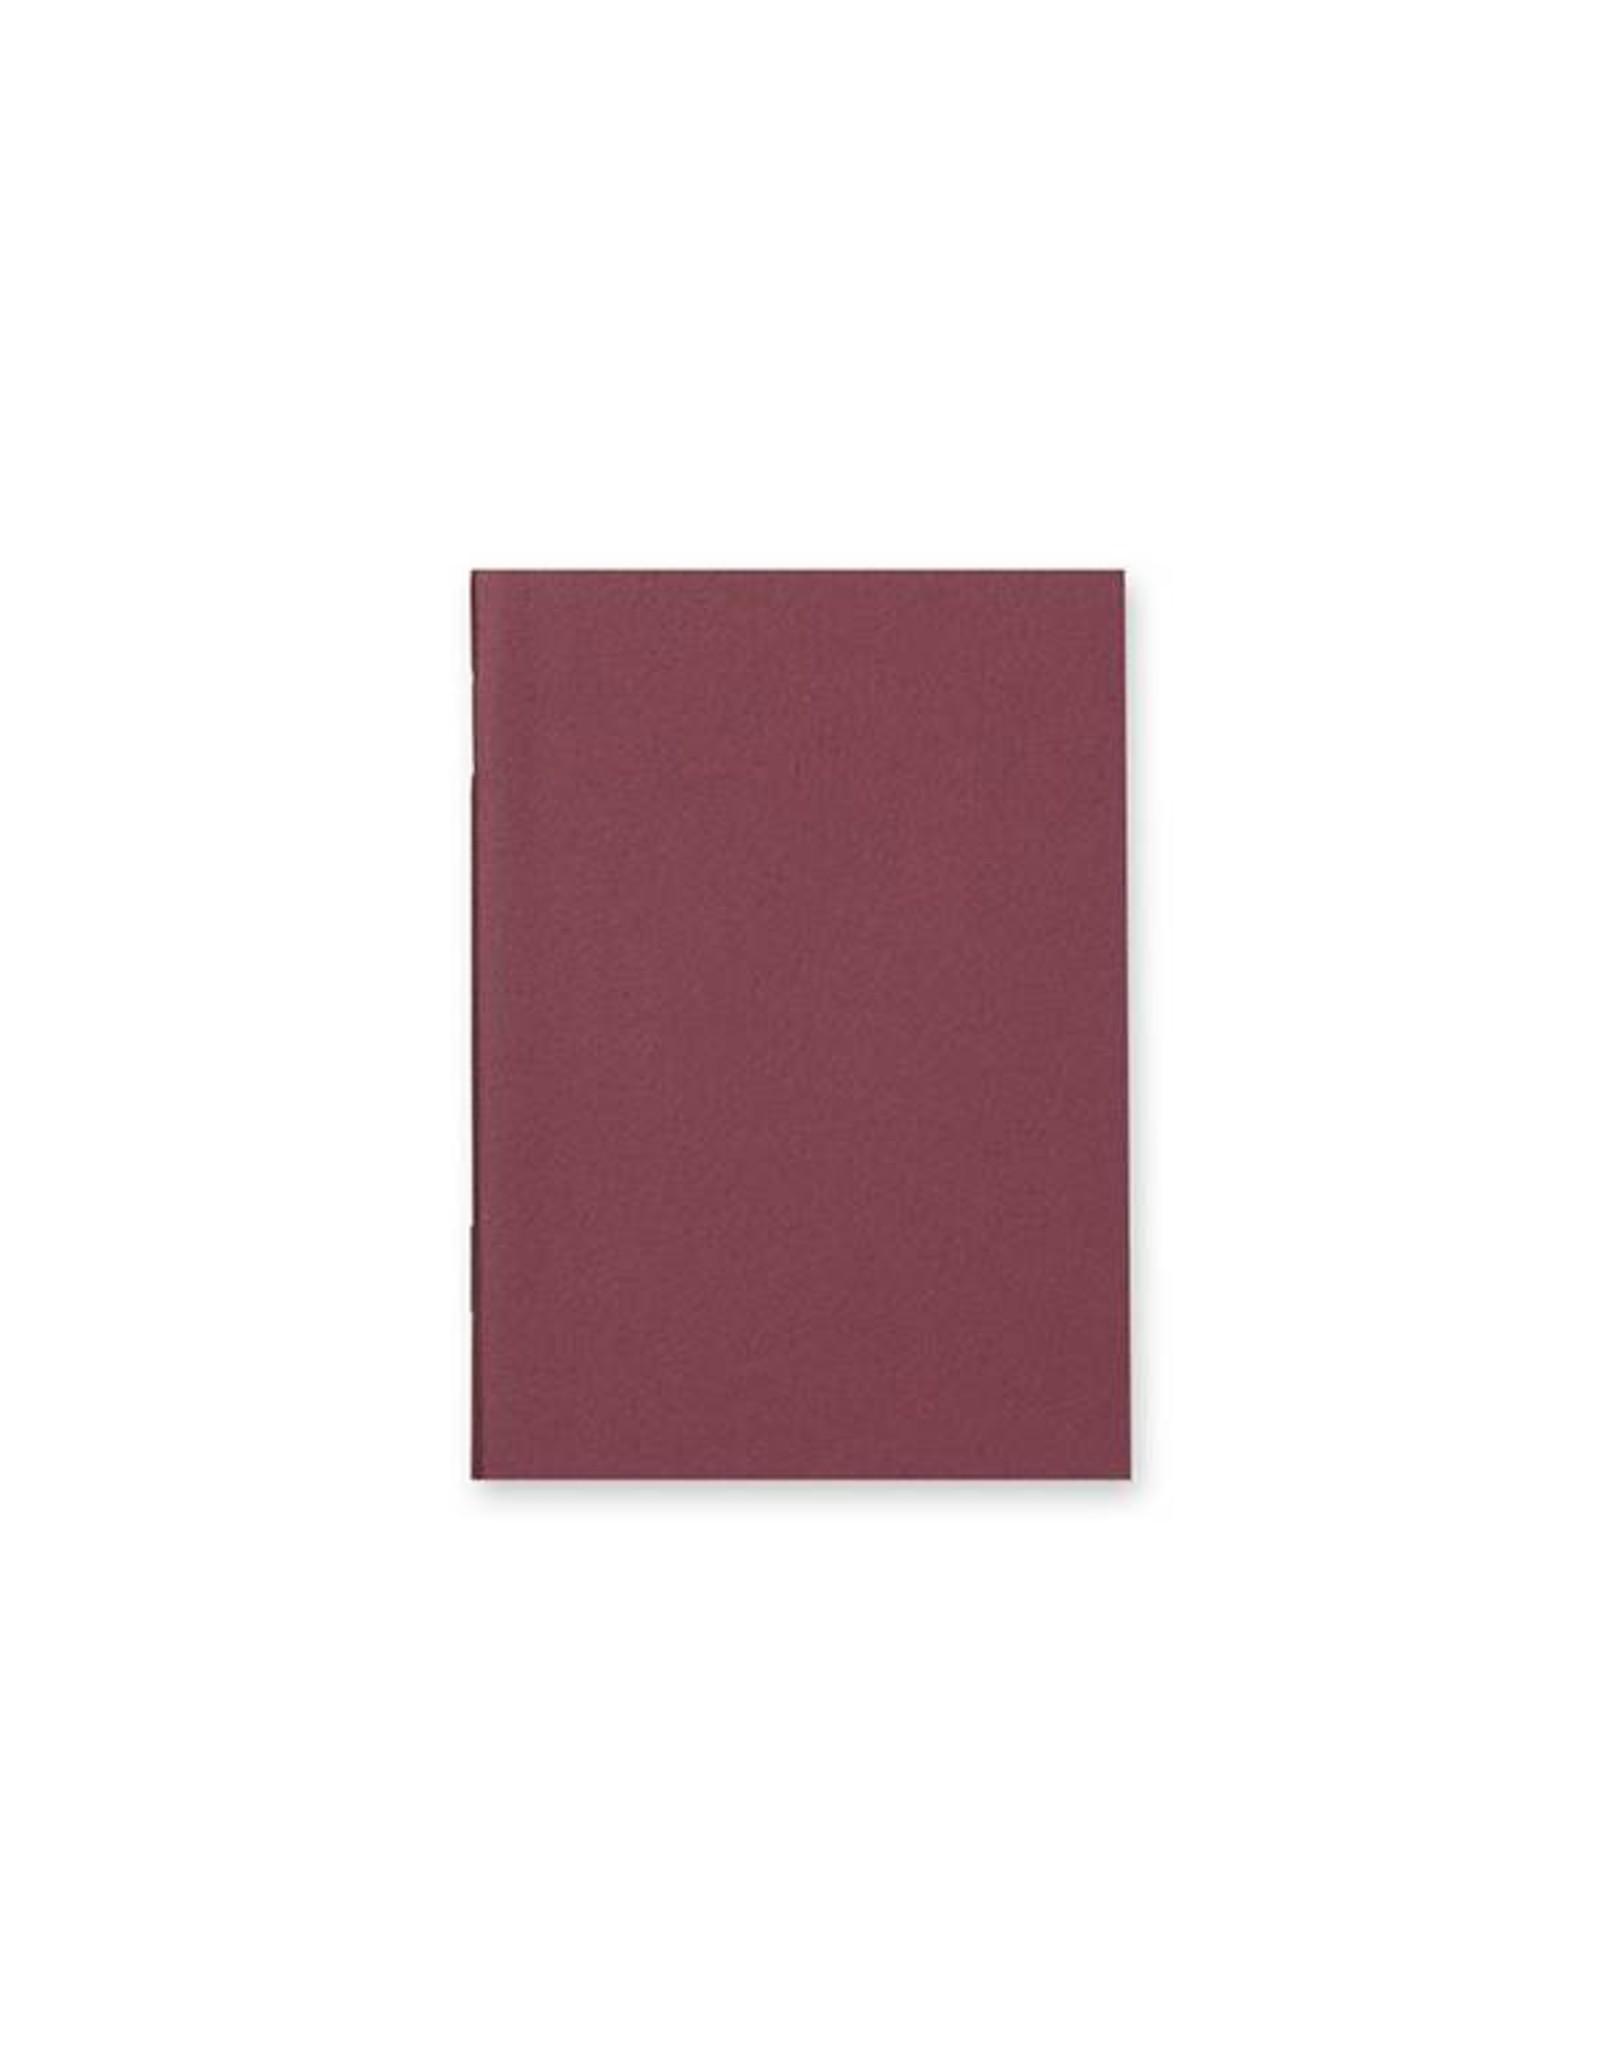 Traveler's Company 003. BLANK REFILL MIDORI TRAVELER'S NOTEBOOK PASSPORT SIZE